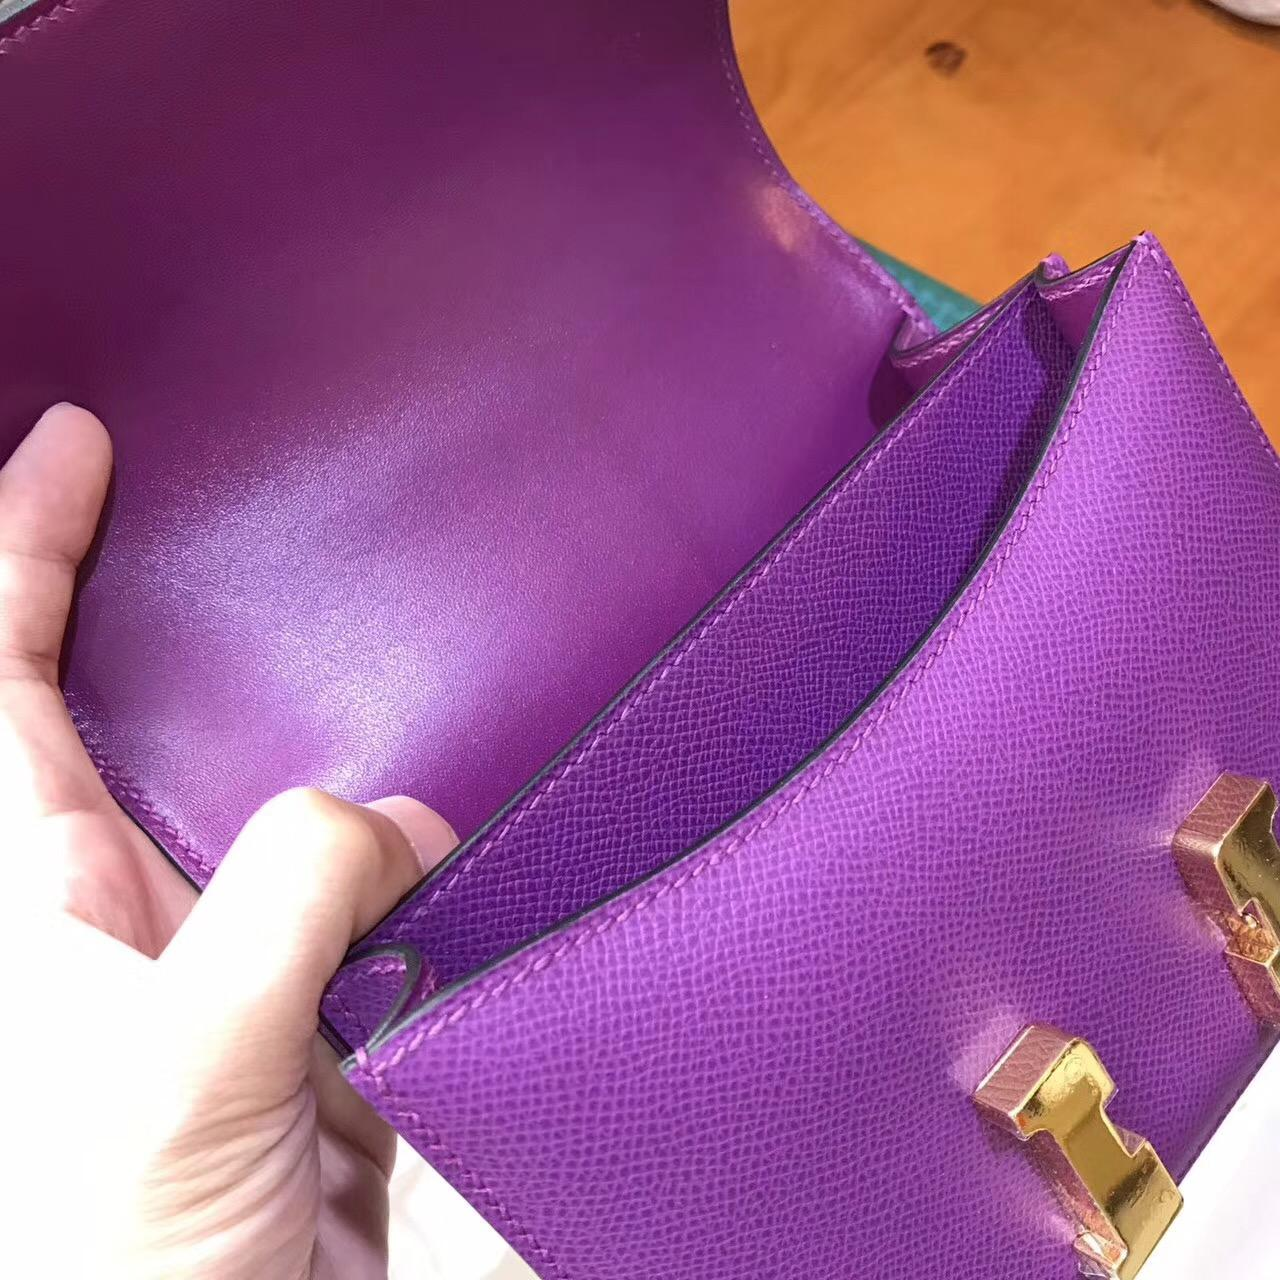 Hermes康斯坦斯包Constance 18(19)Epsom P9海葵紫Anemone PHW金扣